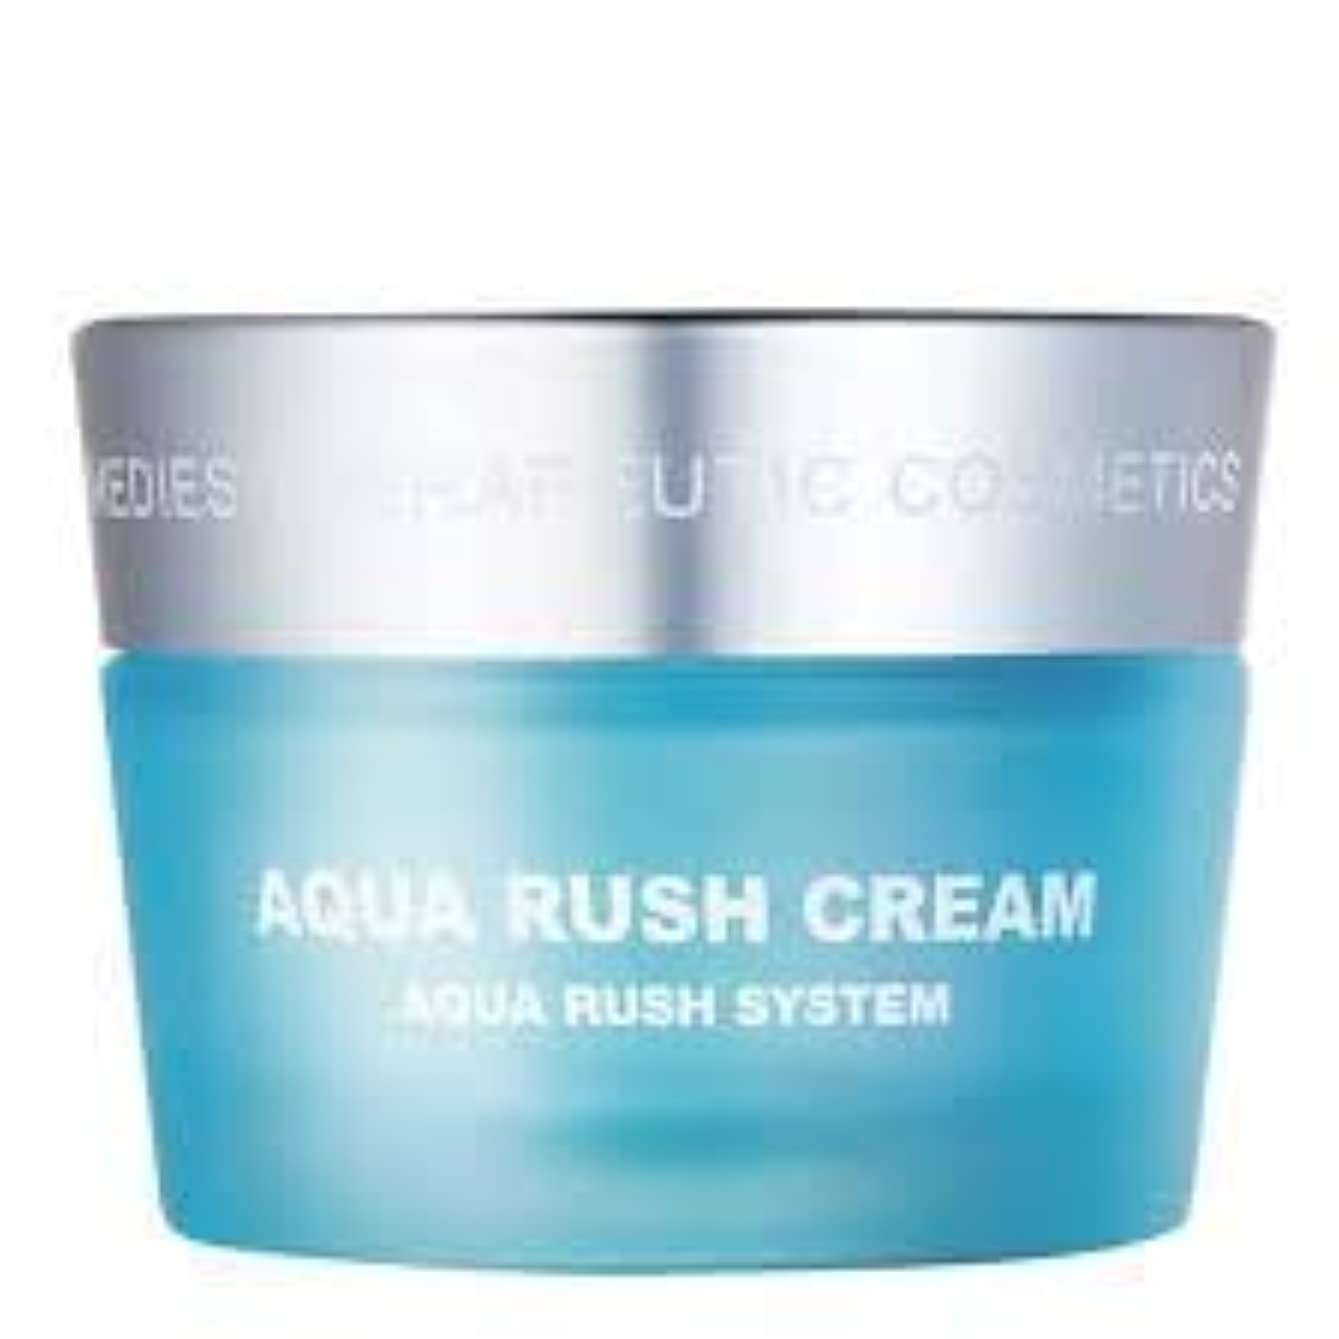 BRTC 乾燥肌に集中的な水分を供給アクアラッシュクリーム1つ60ミリリットル保湿クリーム